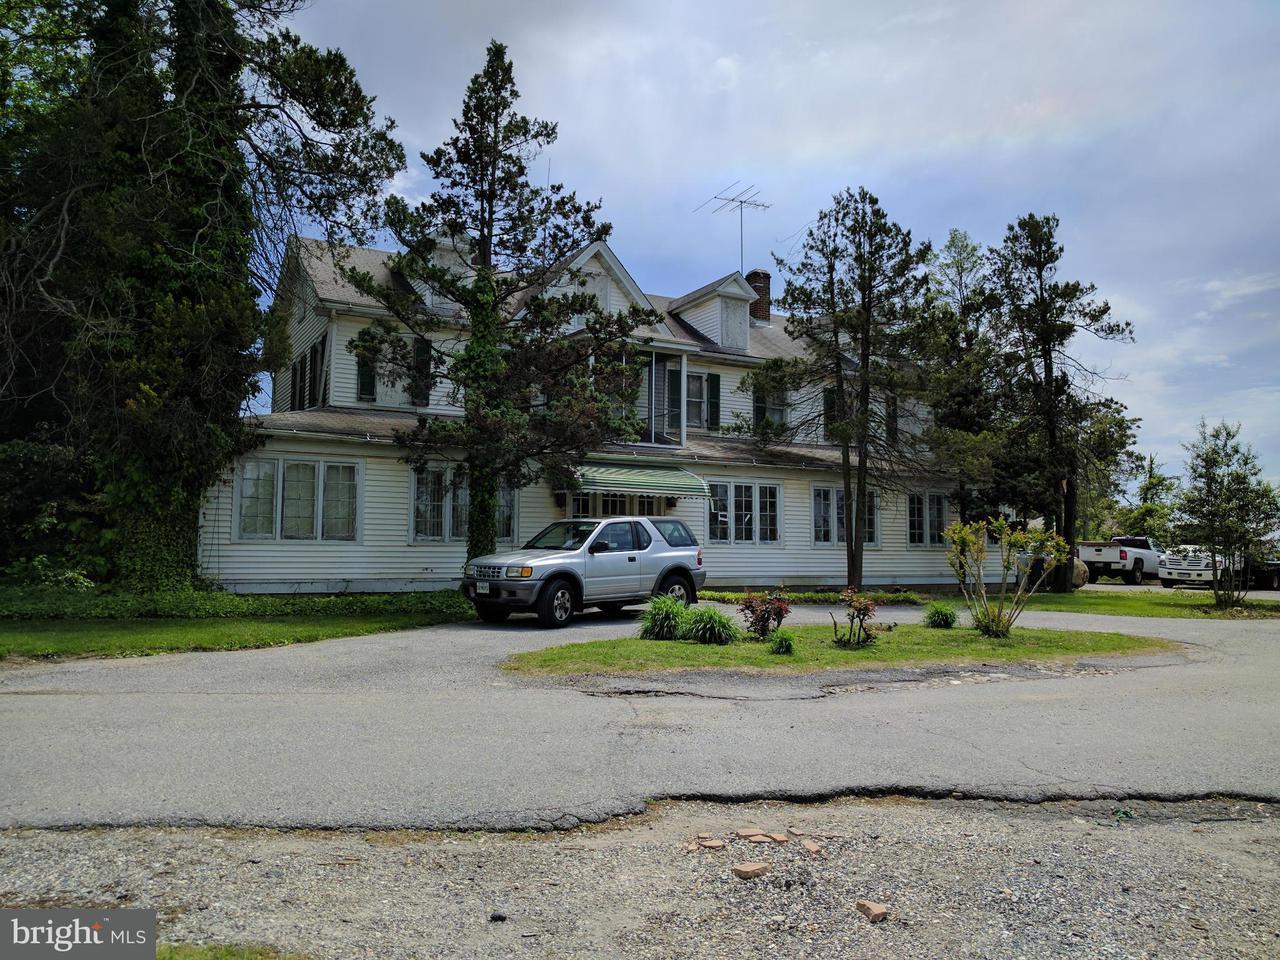 土地 為 出售 在 2957 JESSUP Road 2957 JESSUP Road Jessup, 馬里蘭州 20794 美國